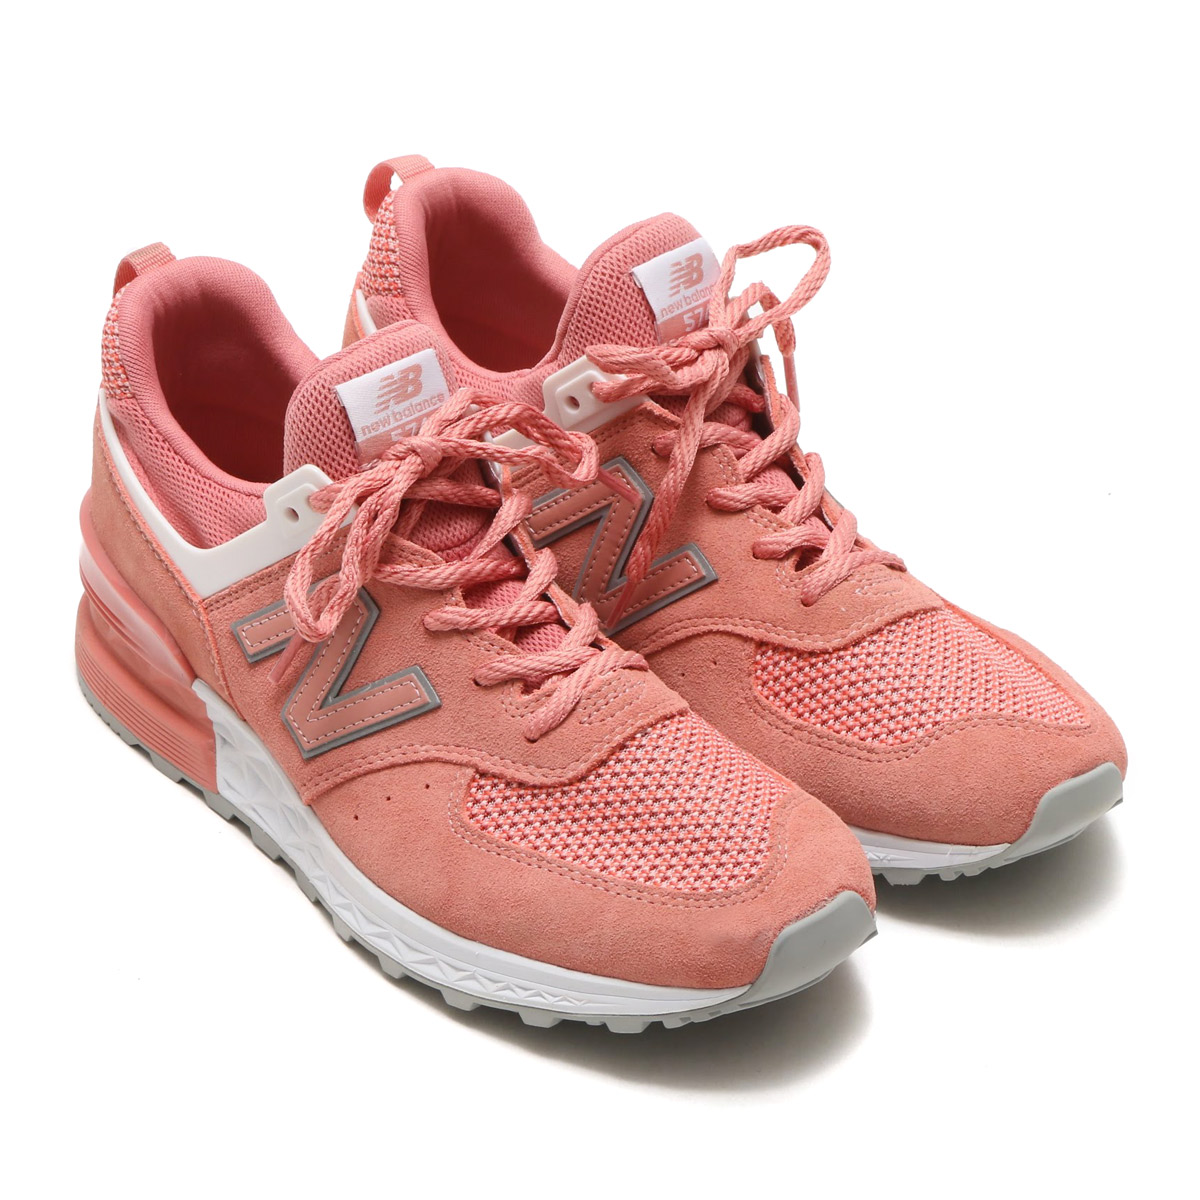 New Balance Mens 574 Sport Sneaker